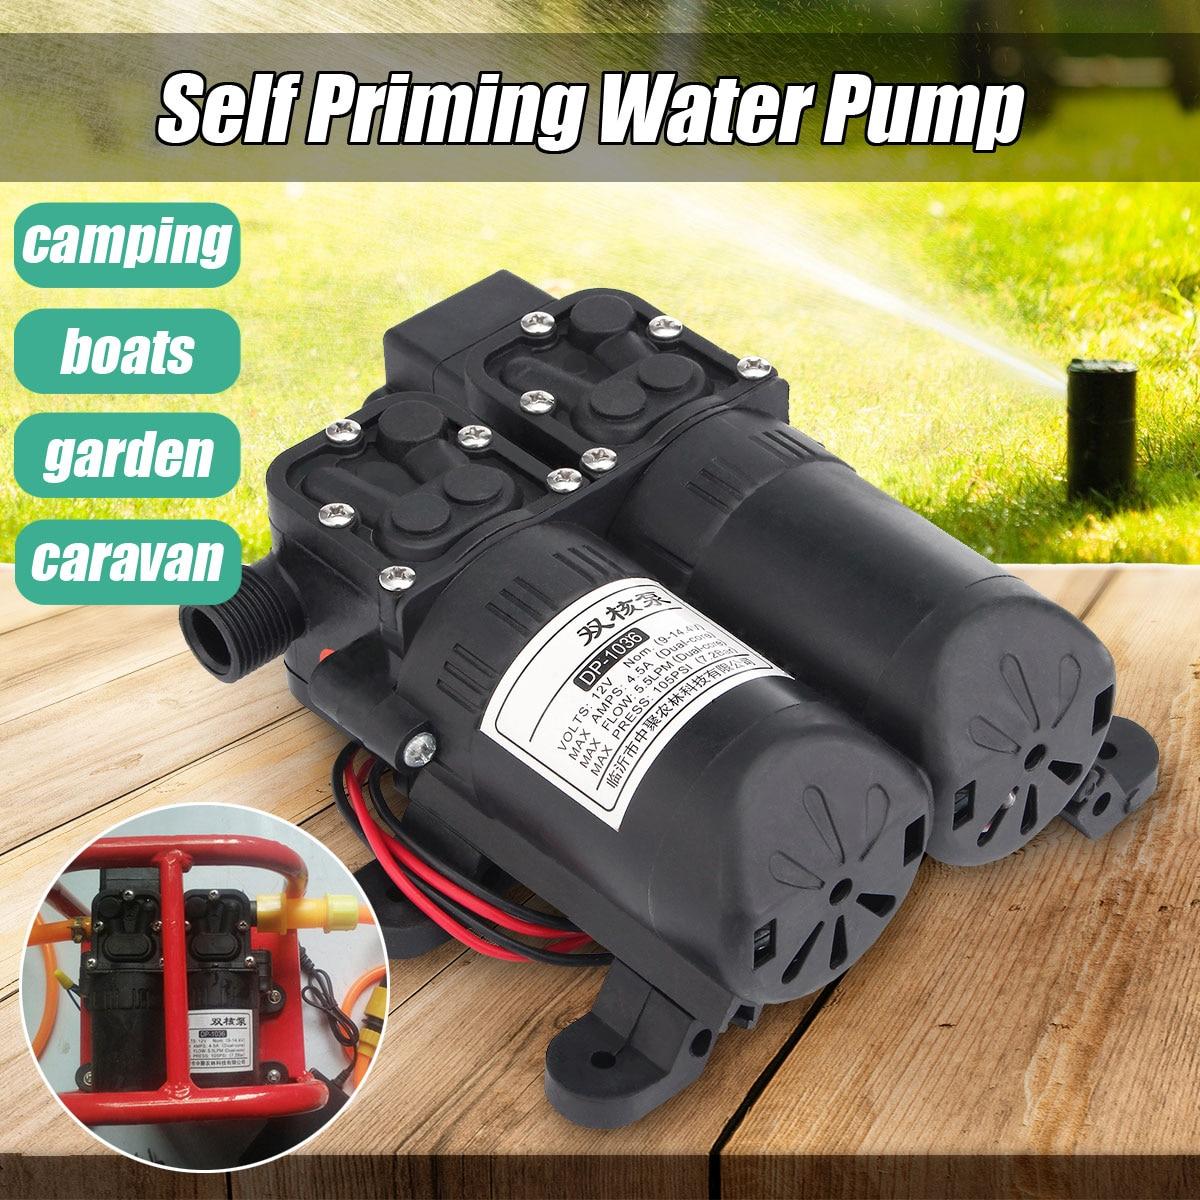 все цены на 12V Dual Electric Motor 5.5LPM 105PSI High Pressure Self Priming Diaphragm Water Pump For Home Garden Boat Caravan Marine Pump онлайн